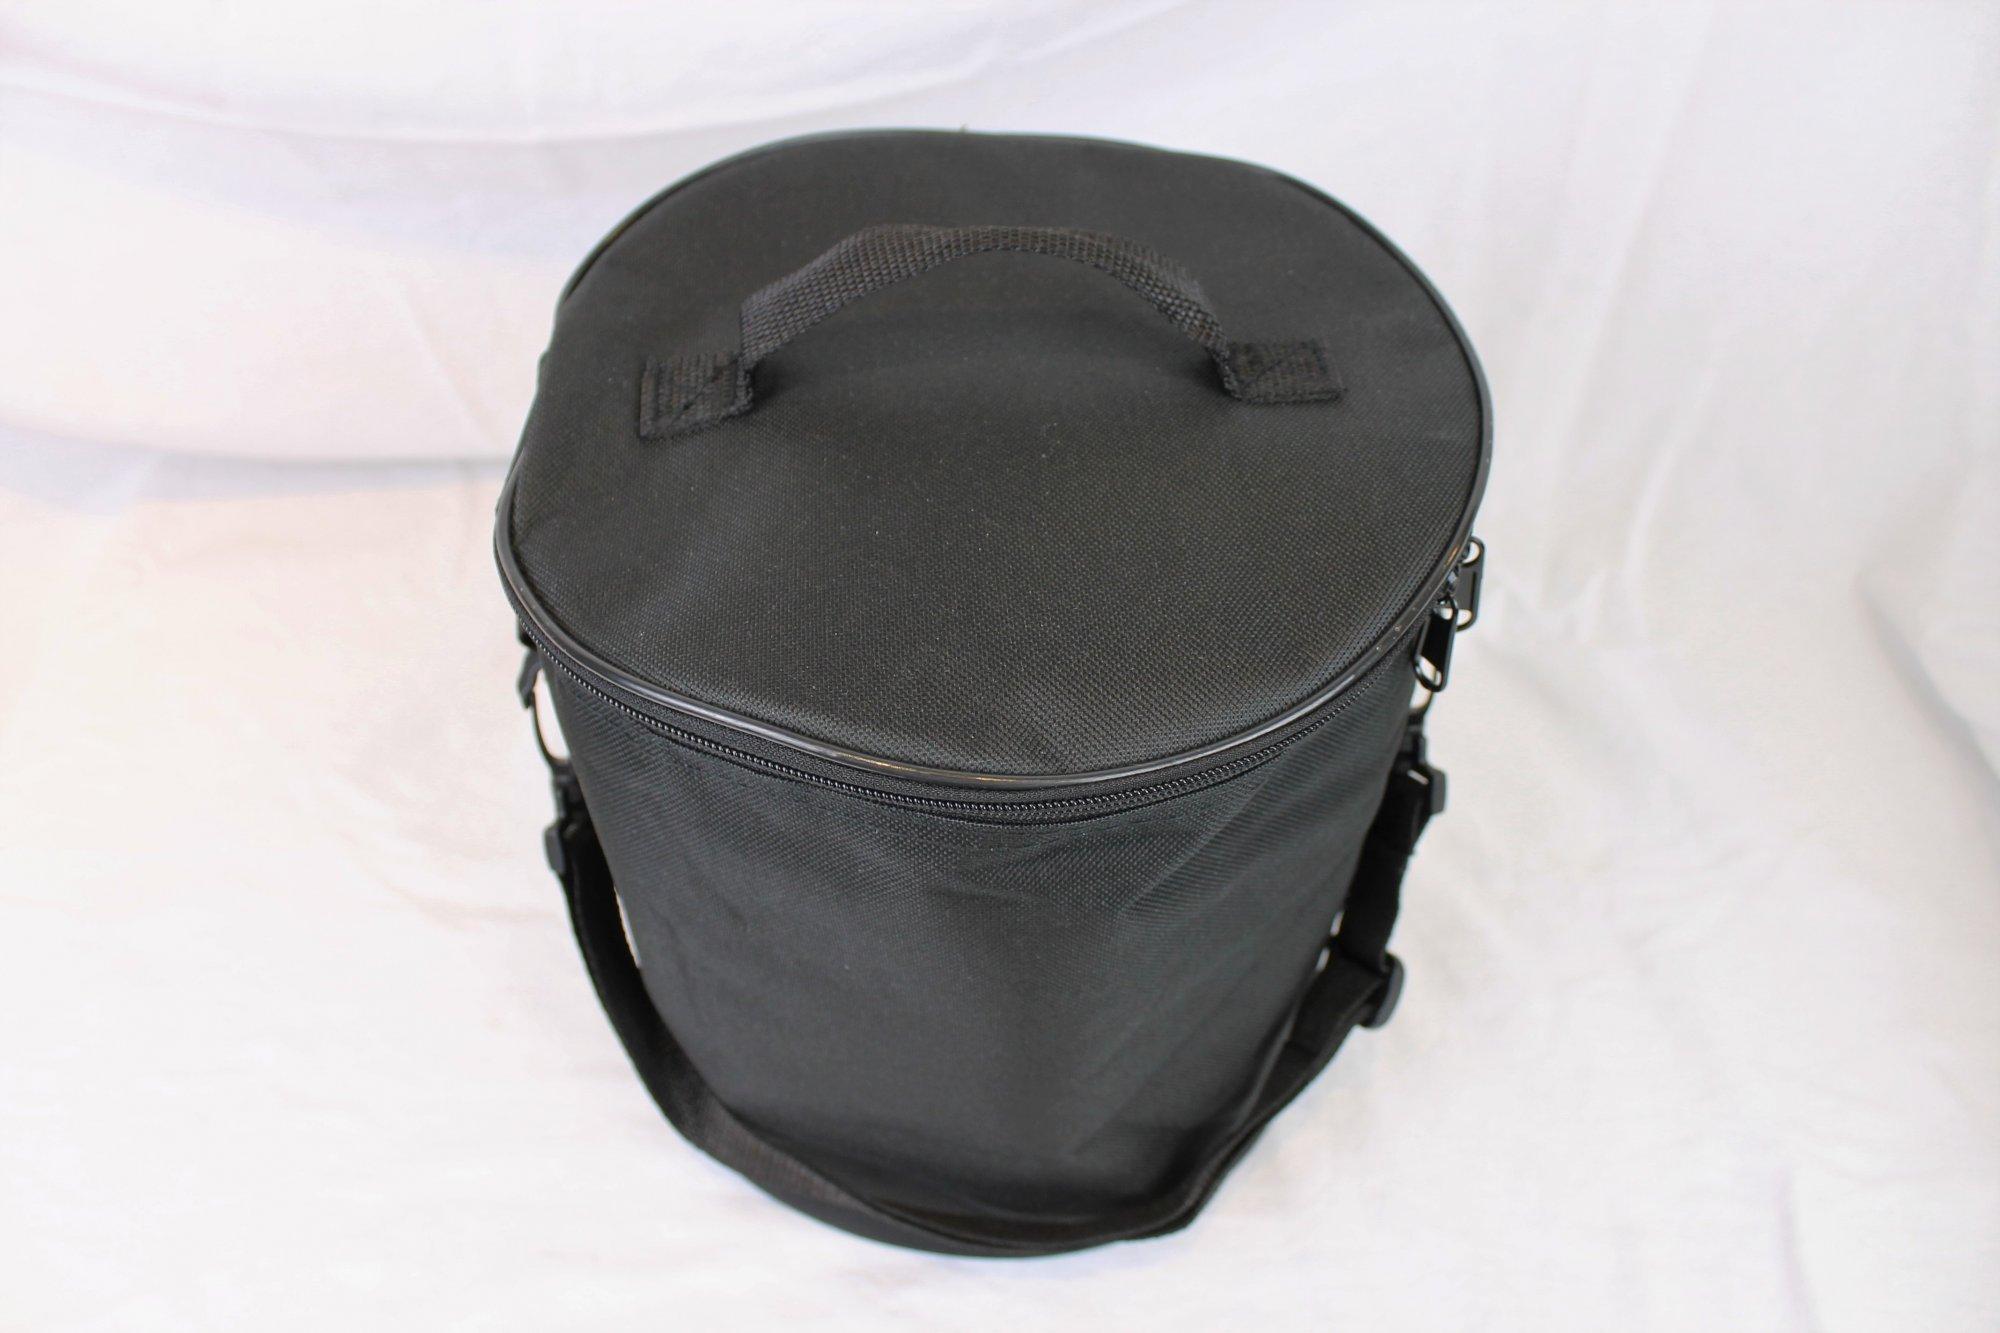 NEW Black Gig Bag for Concertina 9.5 x 8.25 x 8.25 (24cm x 21cm x 21cm)